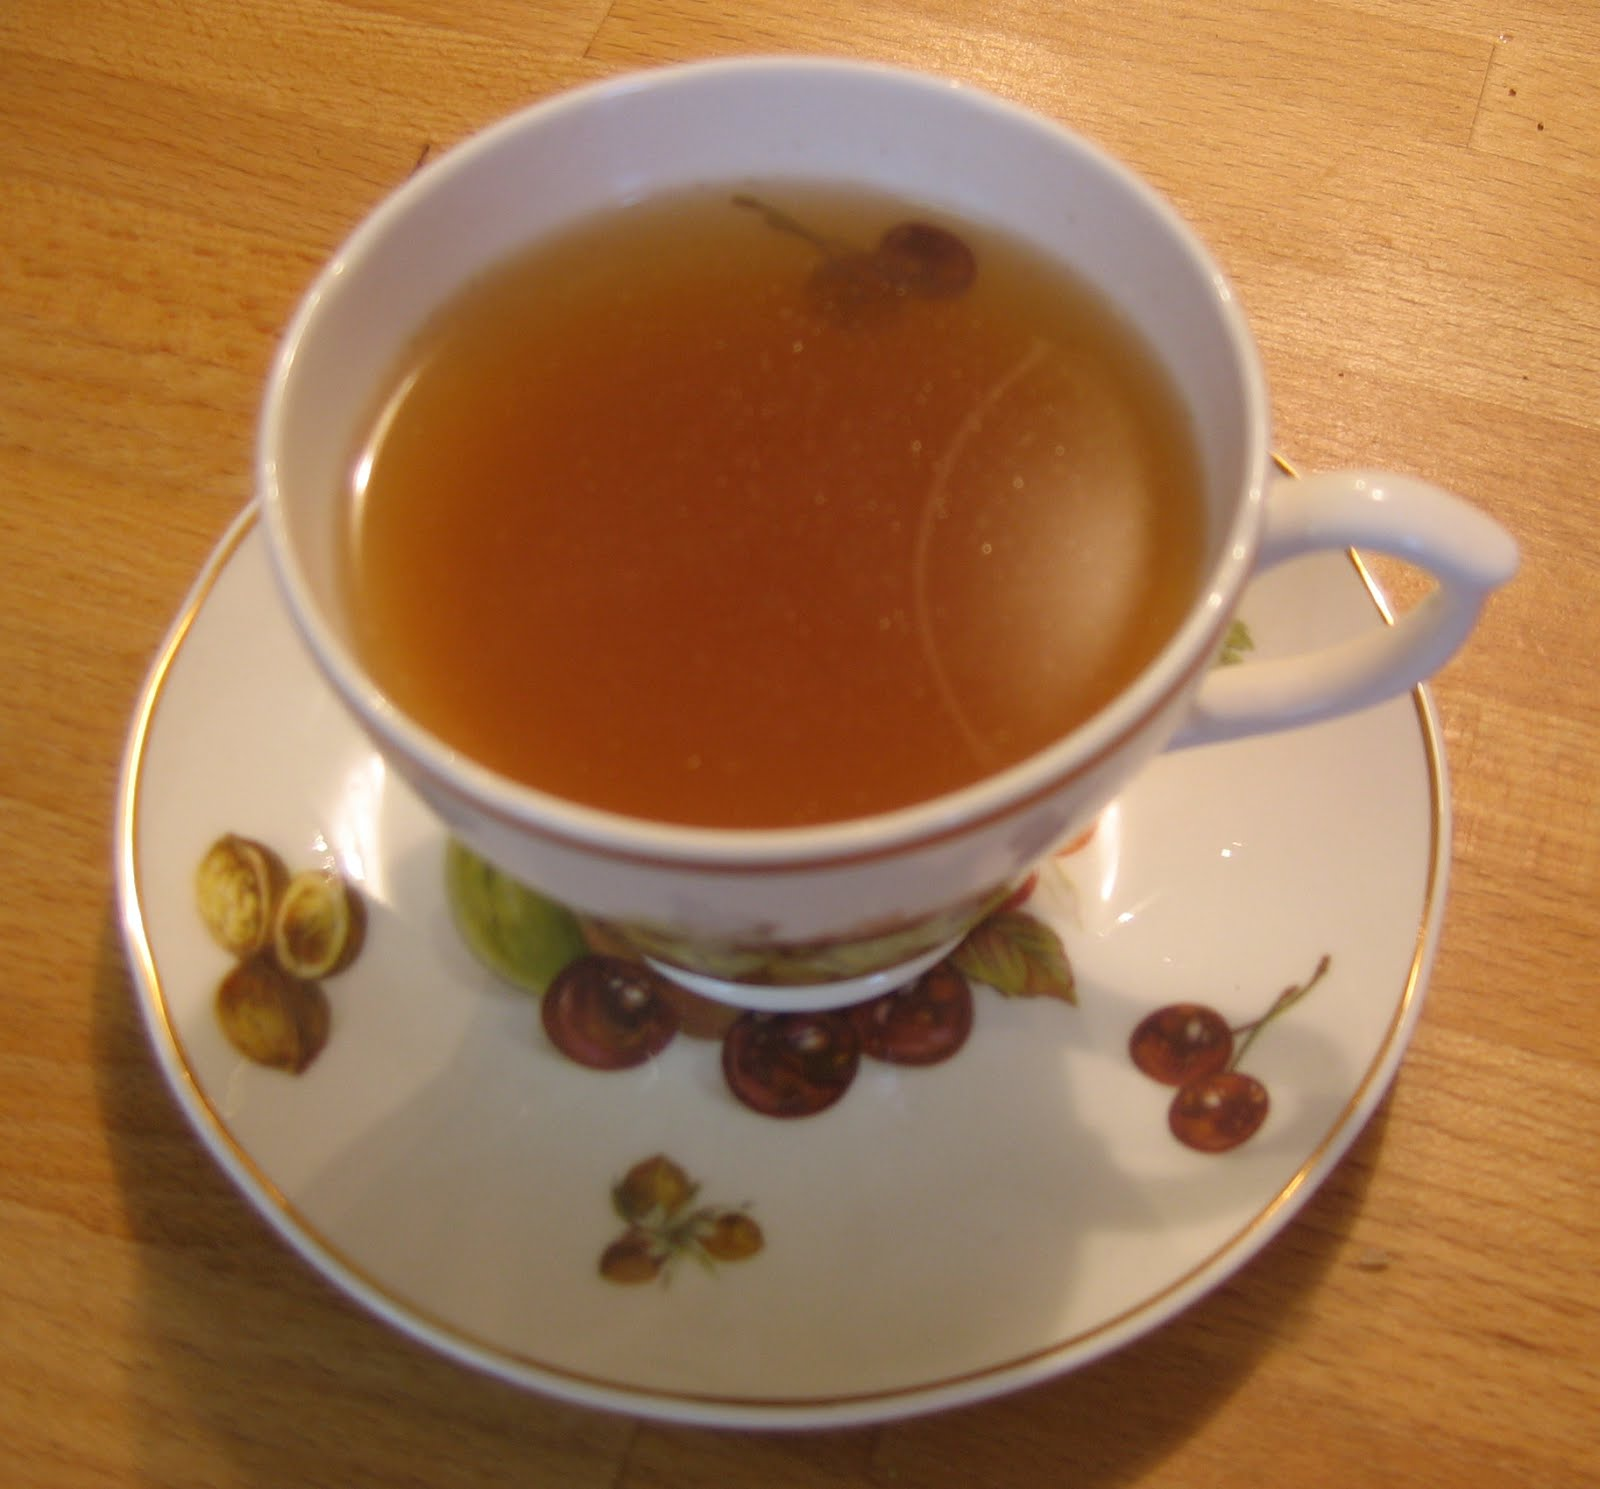 Spiced flax seed tea